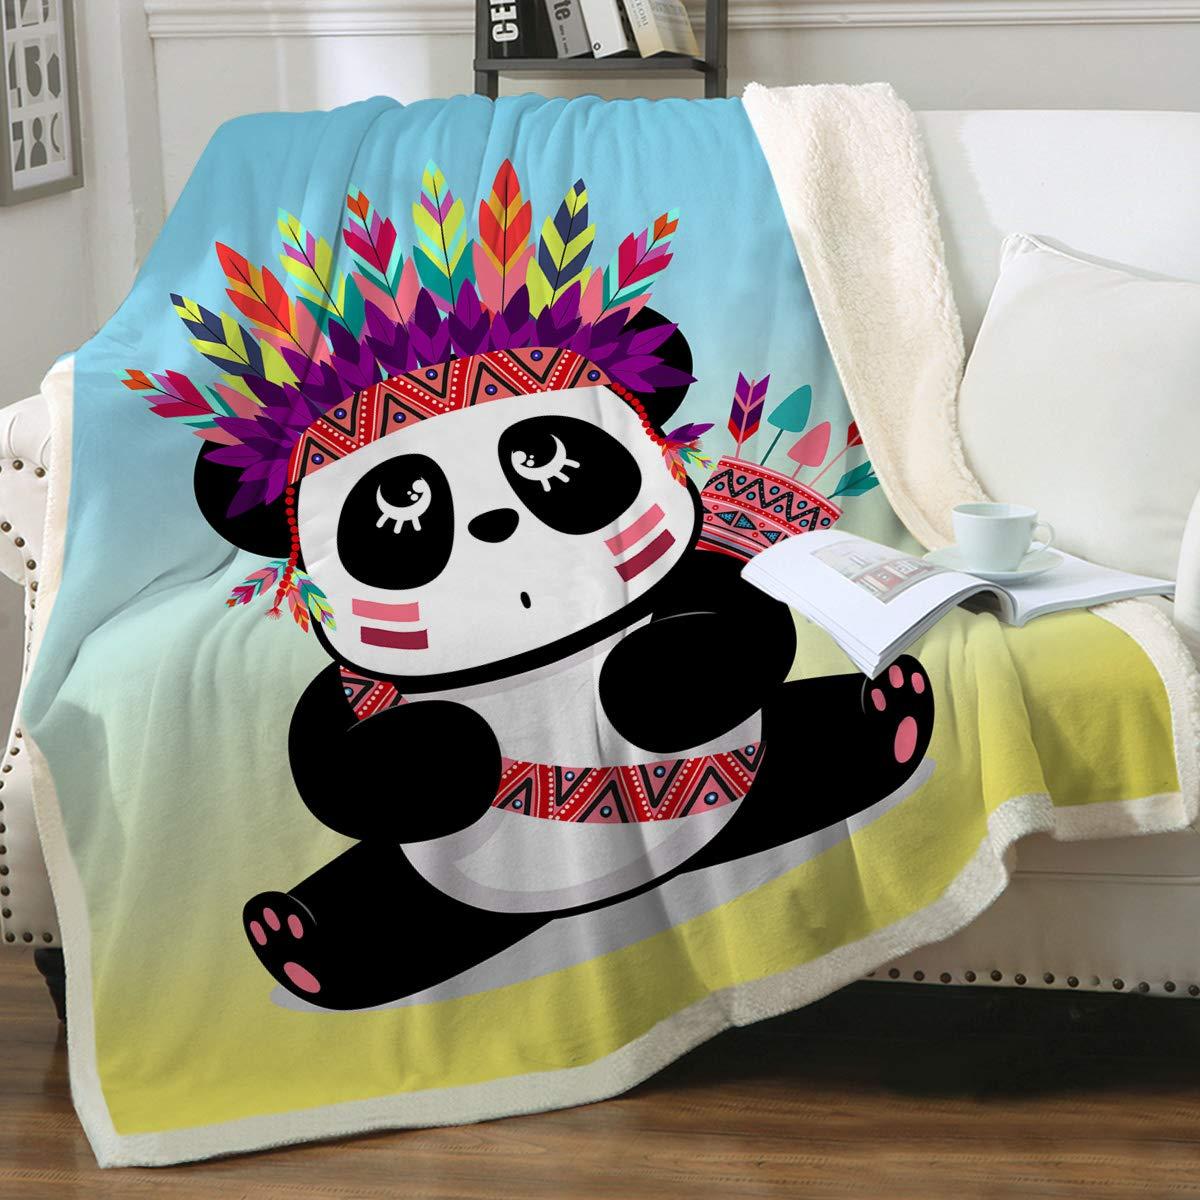 "Sleepwish Panda Bear Sherpa Fleece Throw Blanket for Kids Boys Girls Cute Tribal Panda Fuzzy Blanket Wild Animals Plush Bed Blankets, Teal Blue, Baby(30""x40"")"